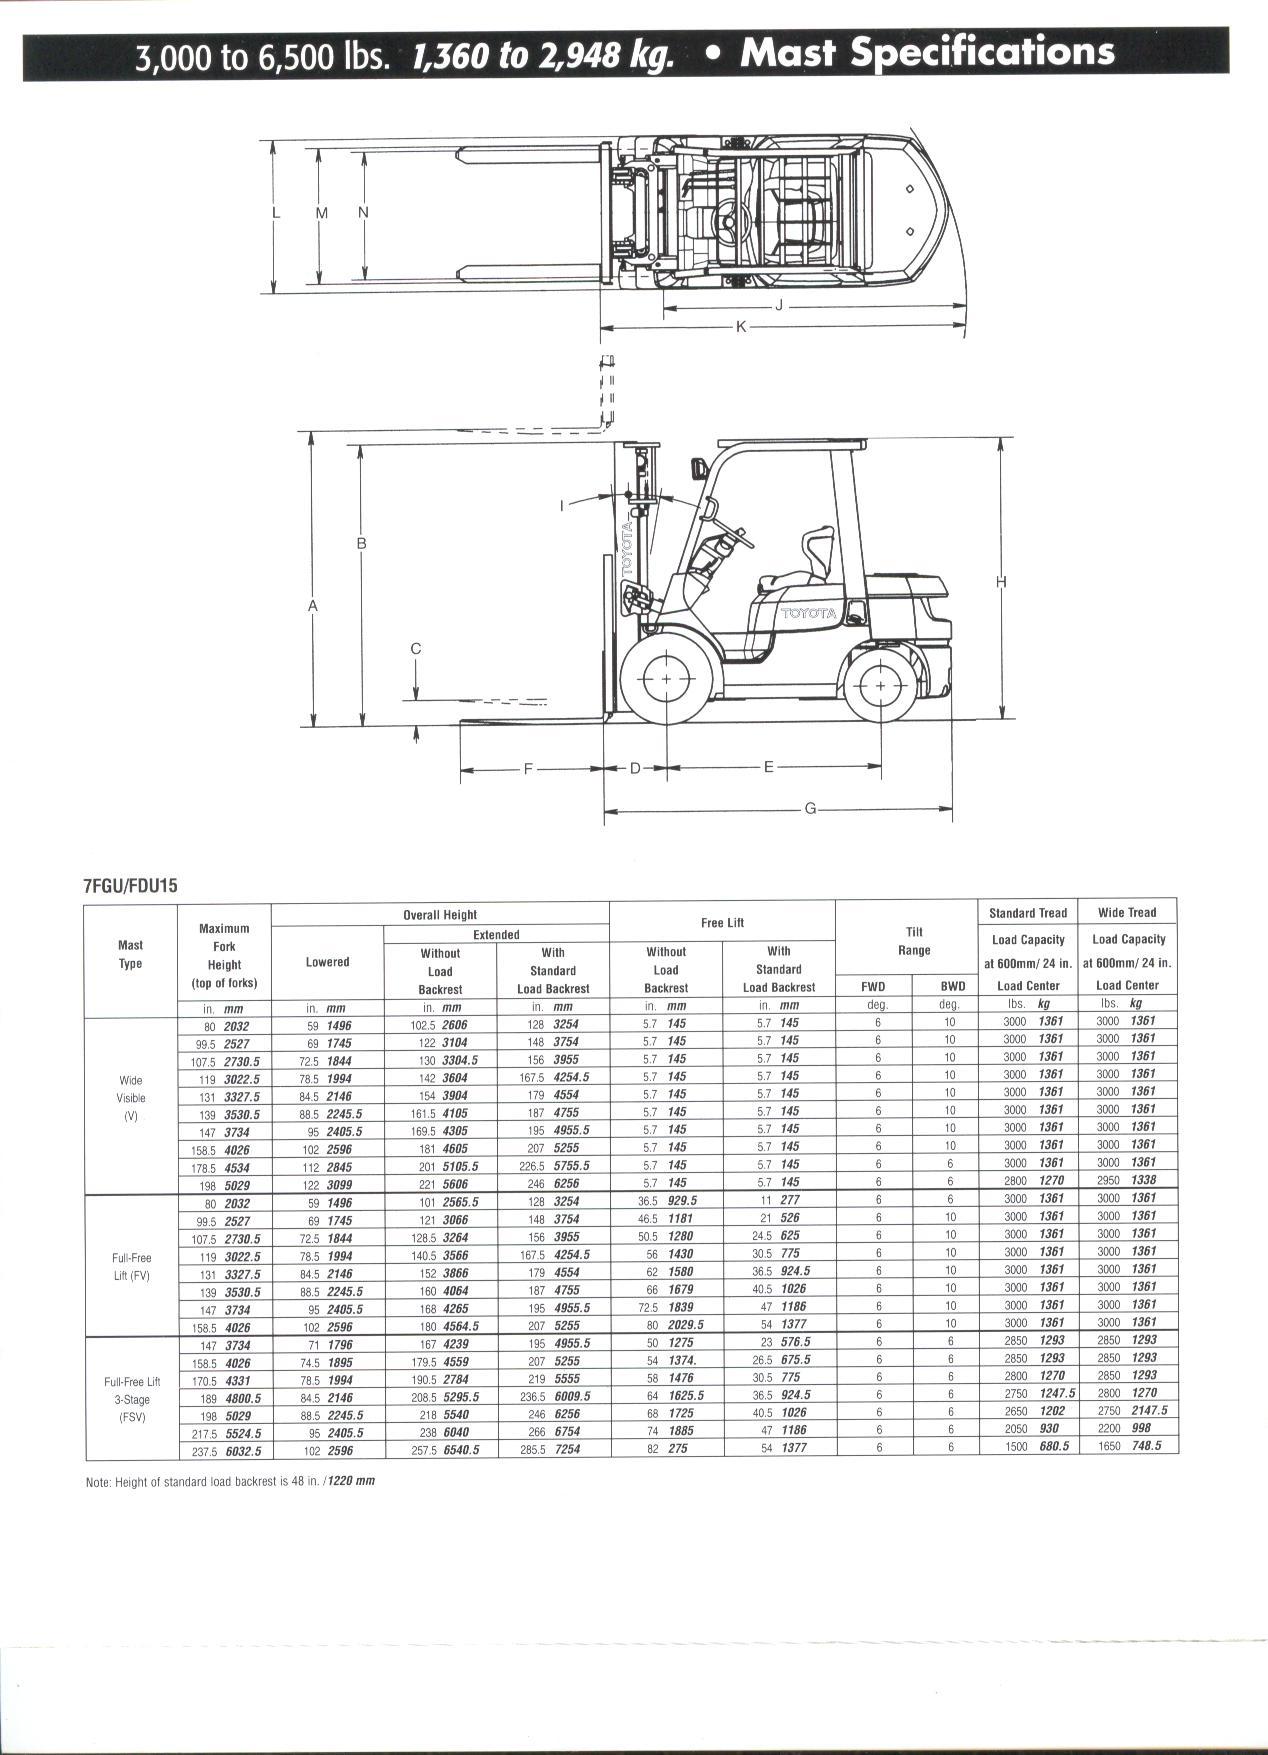 Ogie S Lift Truck Service Ltd